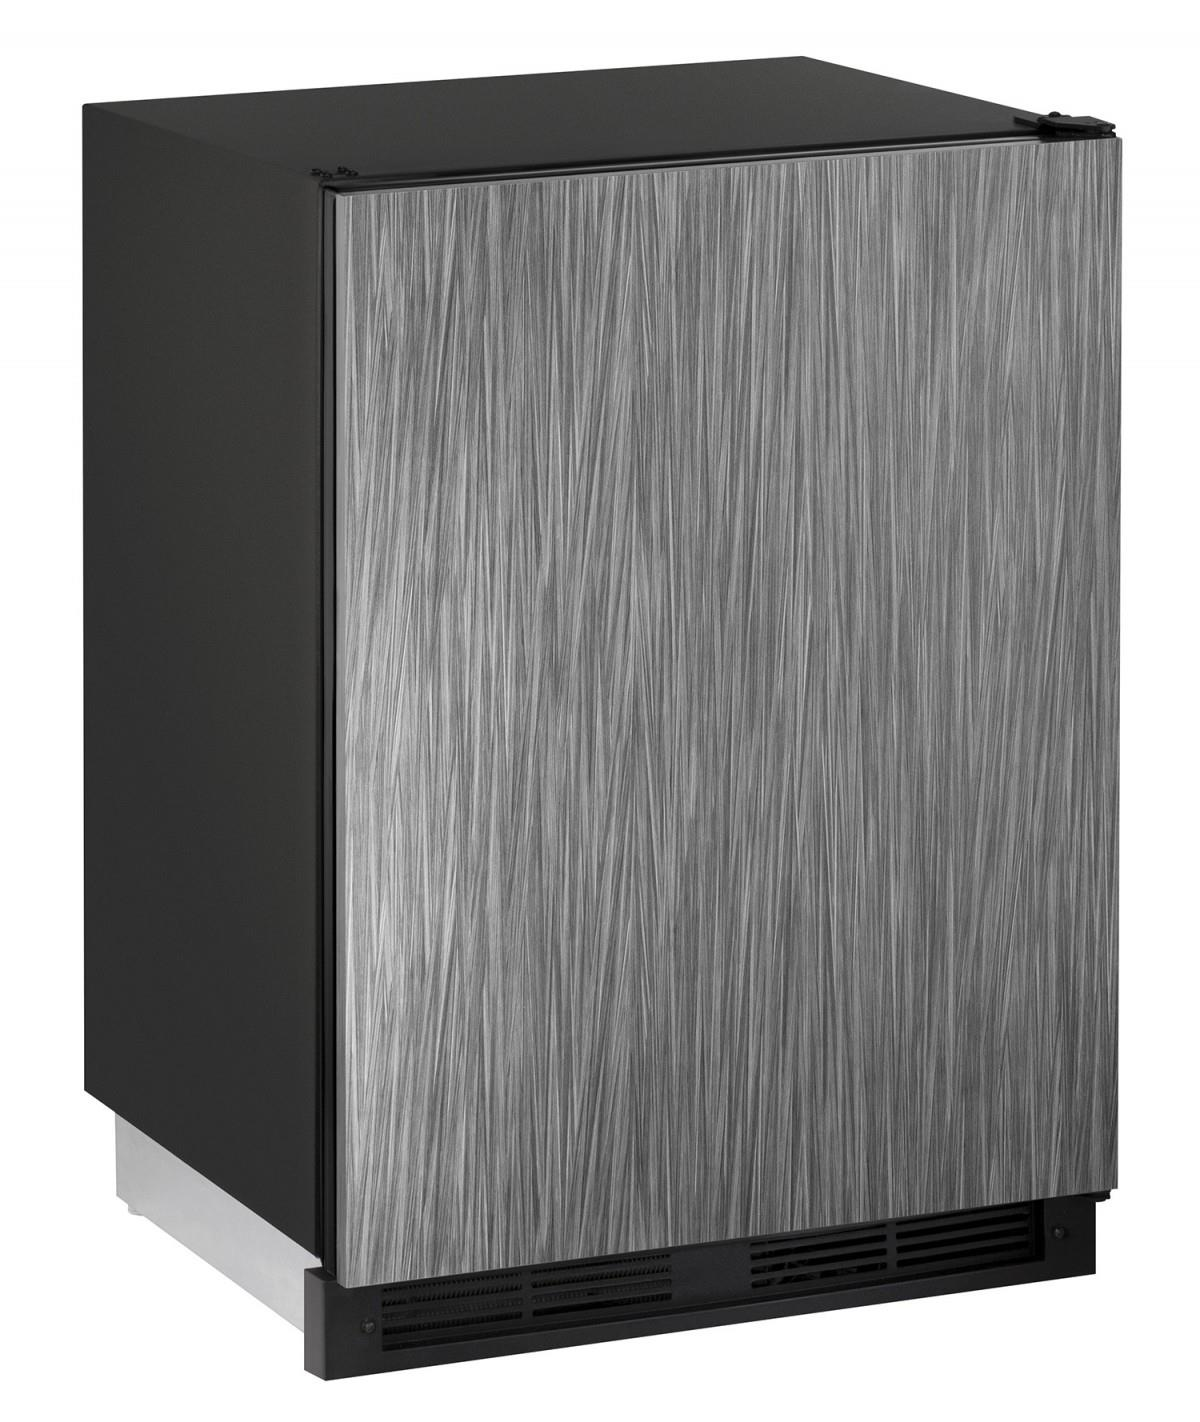 U-Line Refrigerators 4.2 cu. ft. Compact Refrigerator - Item Number: U-1224RFINT-00A